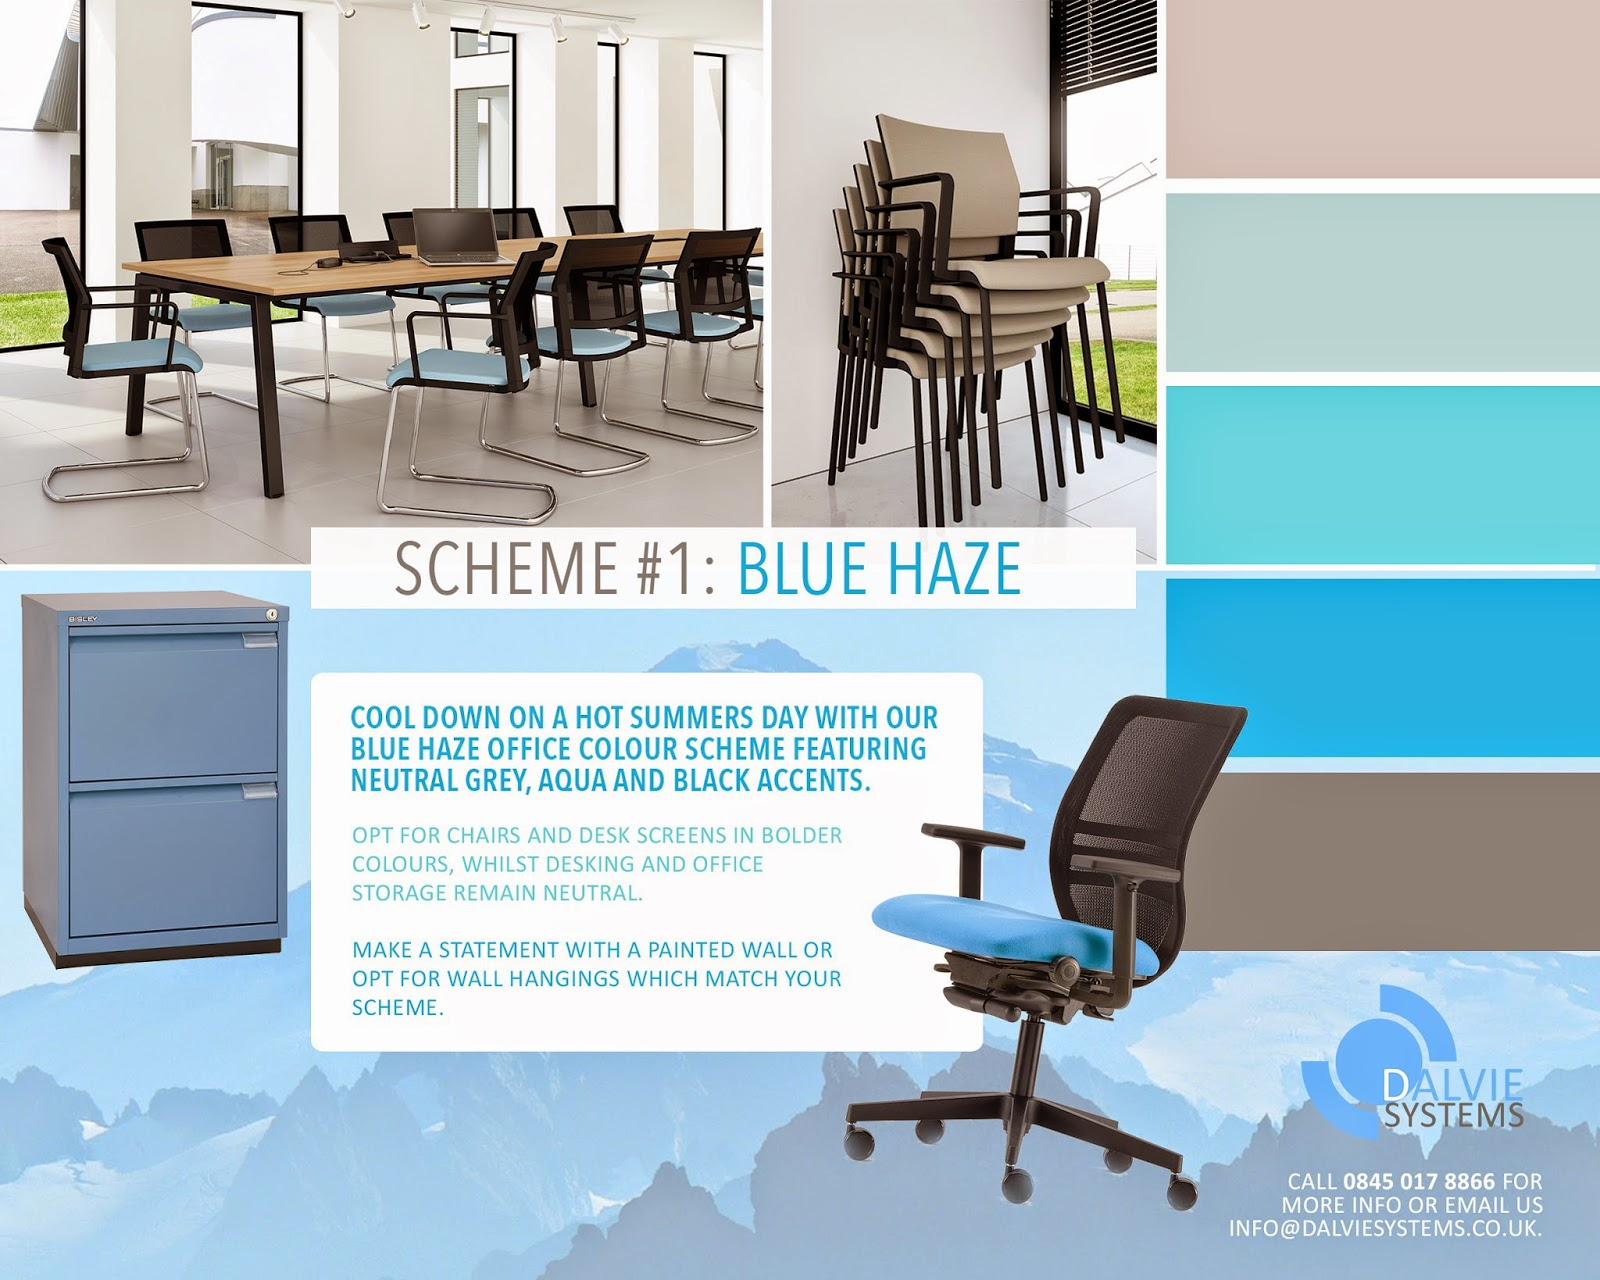 office colour scheme. Dalvie Systems - Company Blog: 5 Summer Office Colour Schemes You\u0027ll Love. Scheme